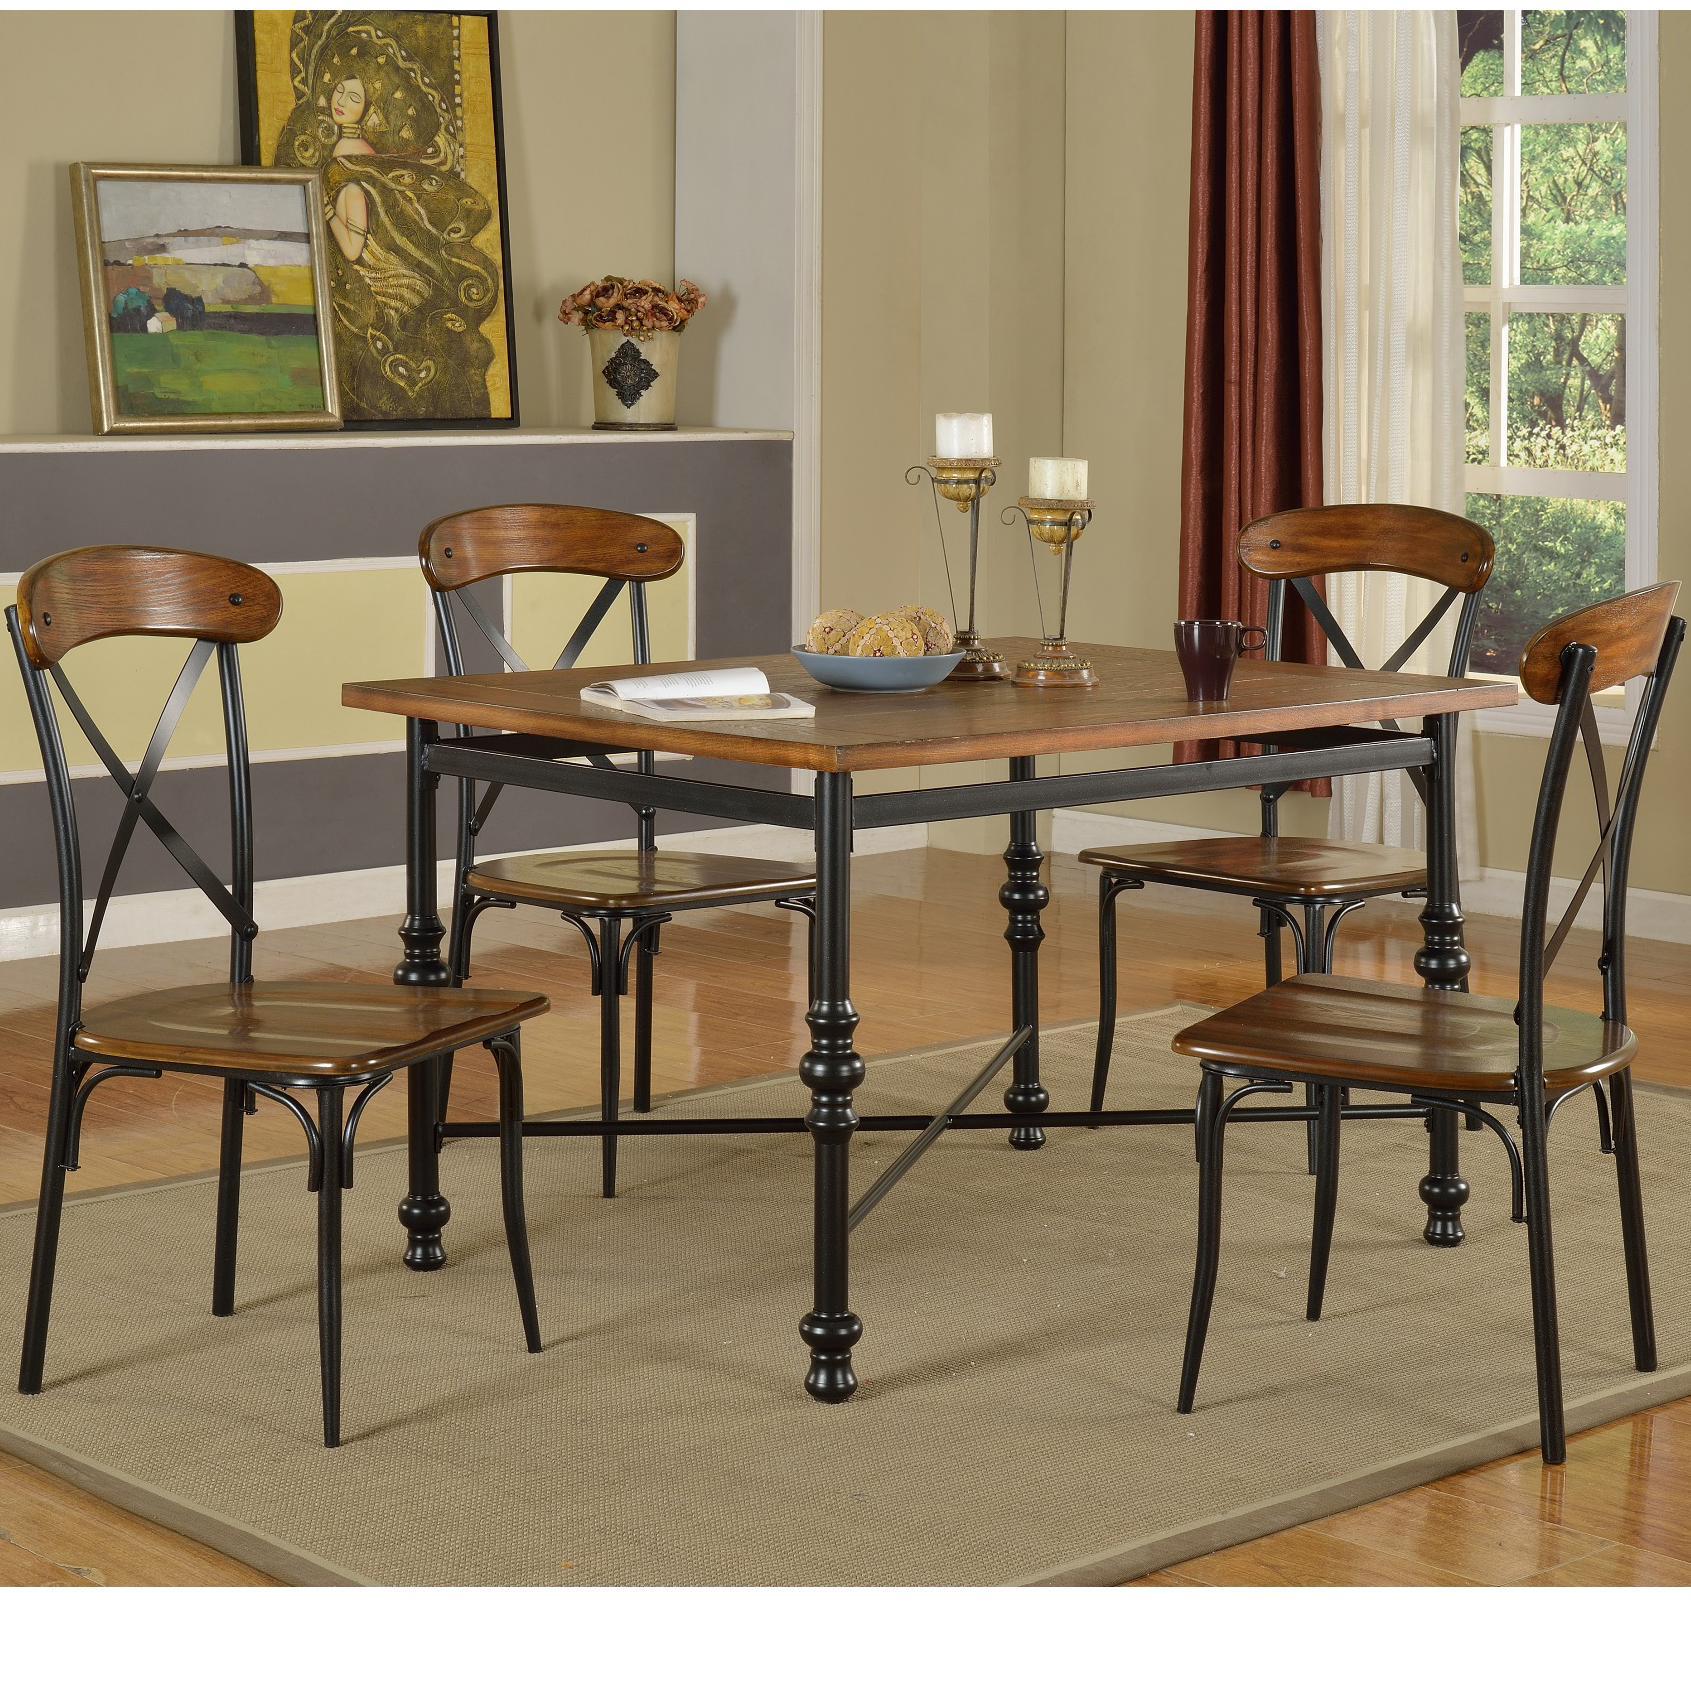 Fullsize Of Pub Table Set